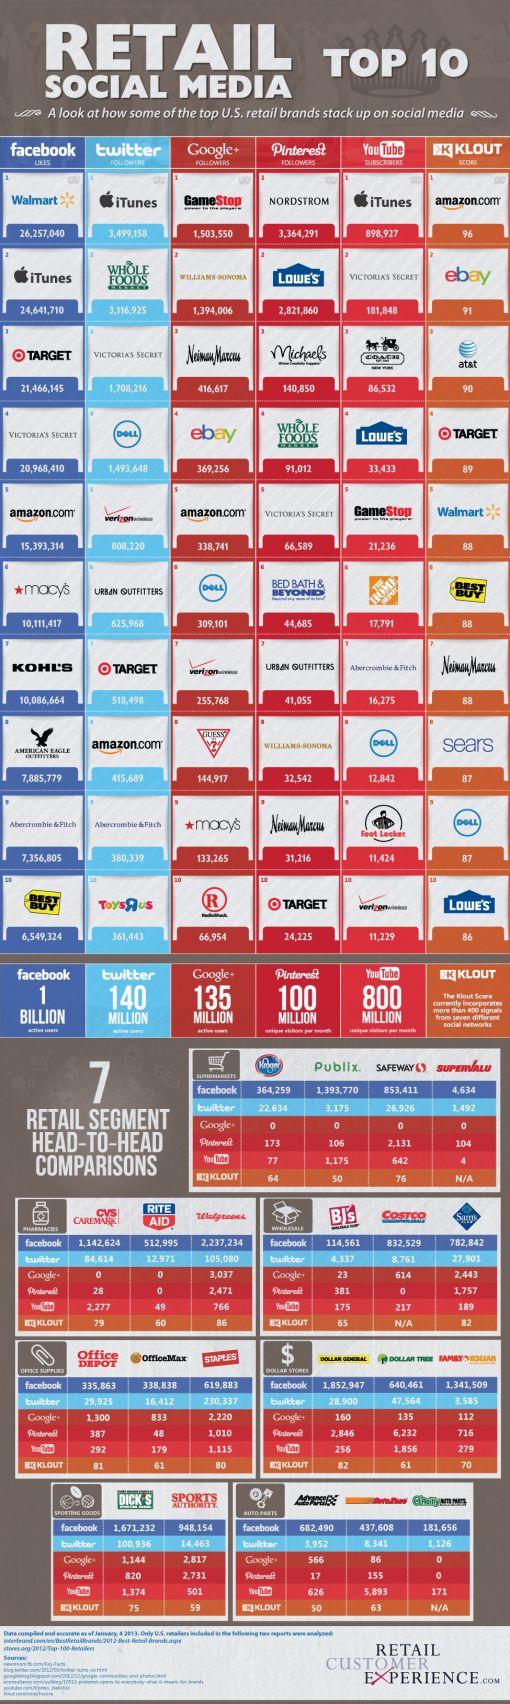 retail-social-media-top-10